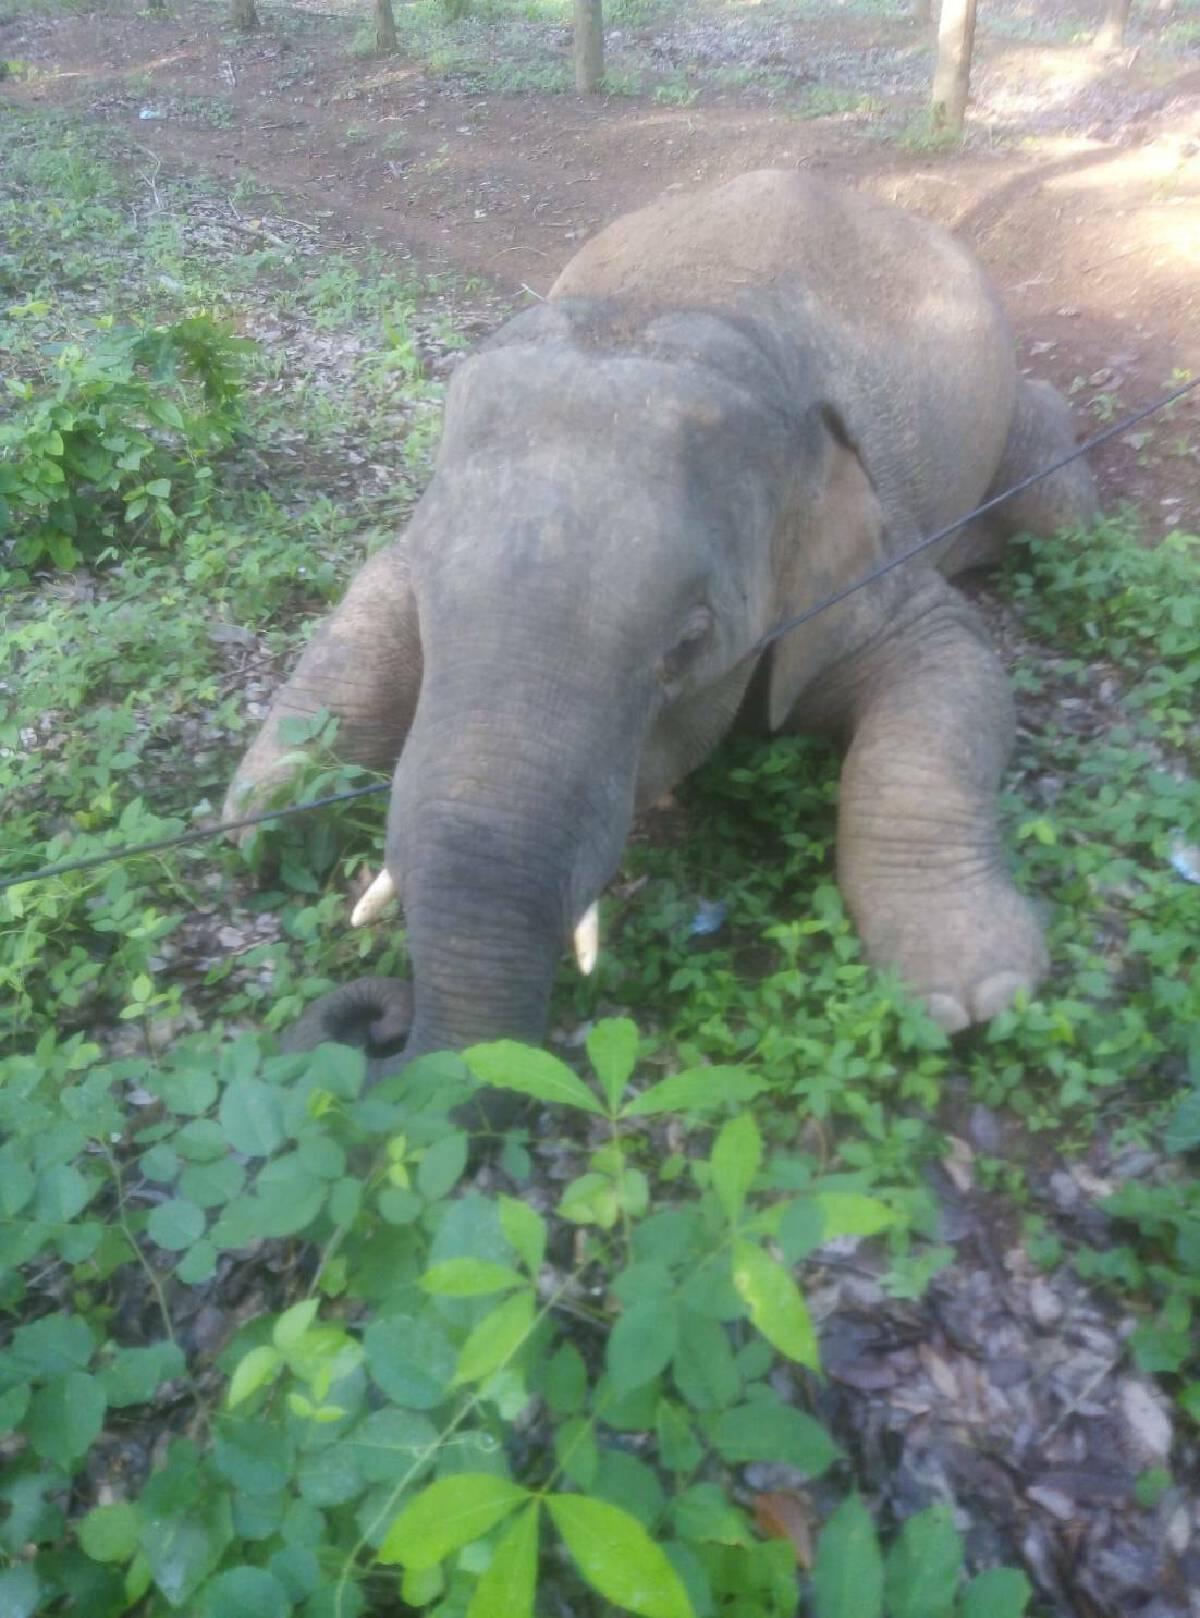 Wild elephant found dead in Chachoengsao rubber plantation